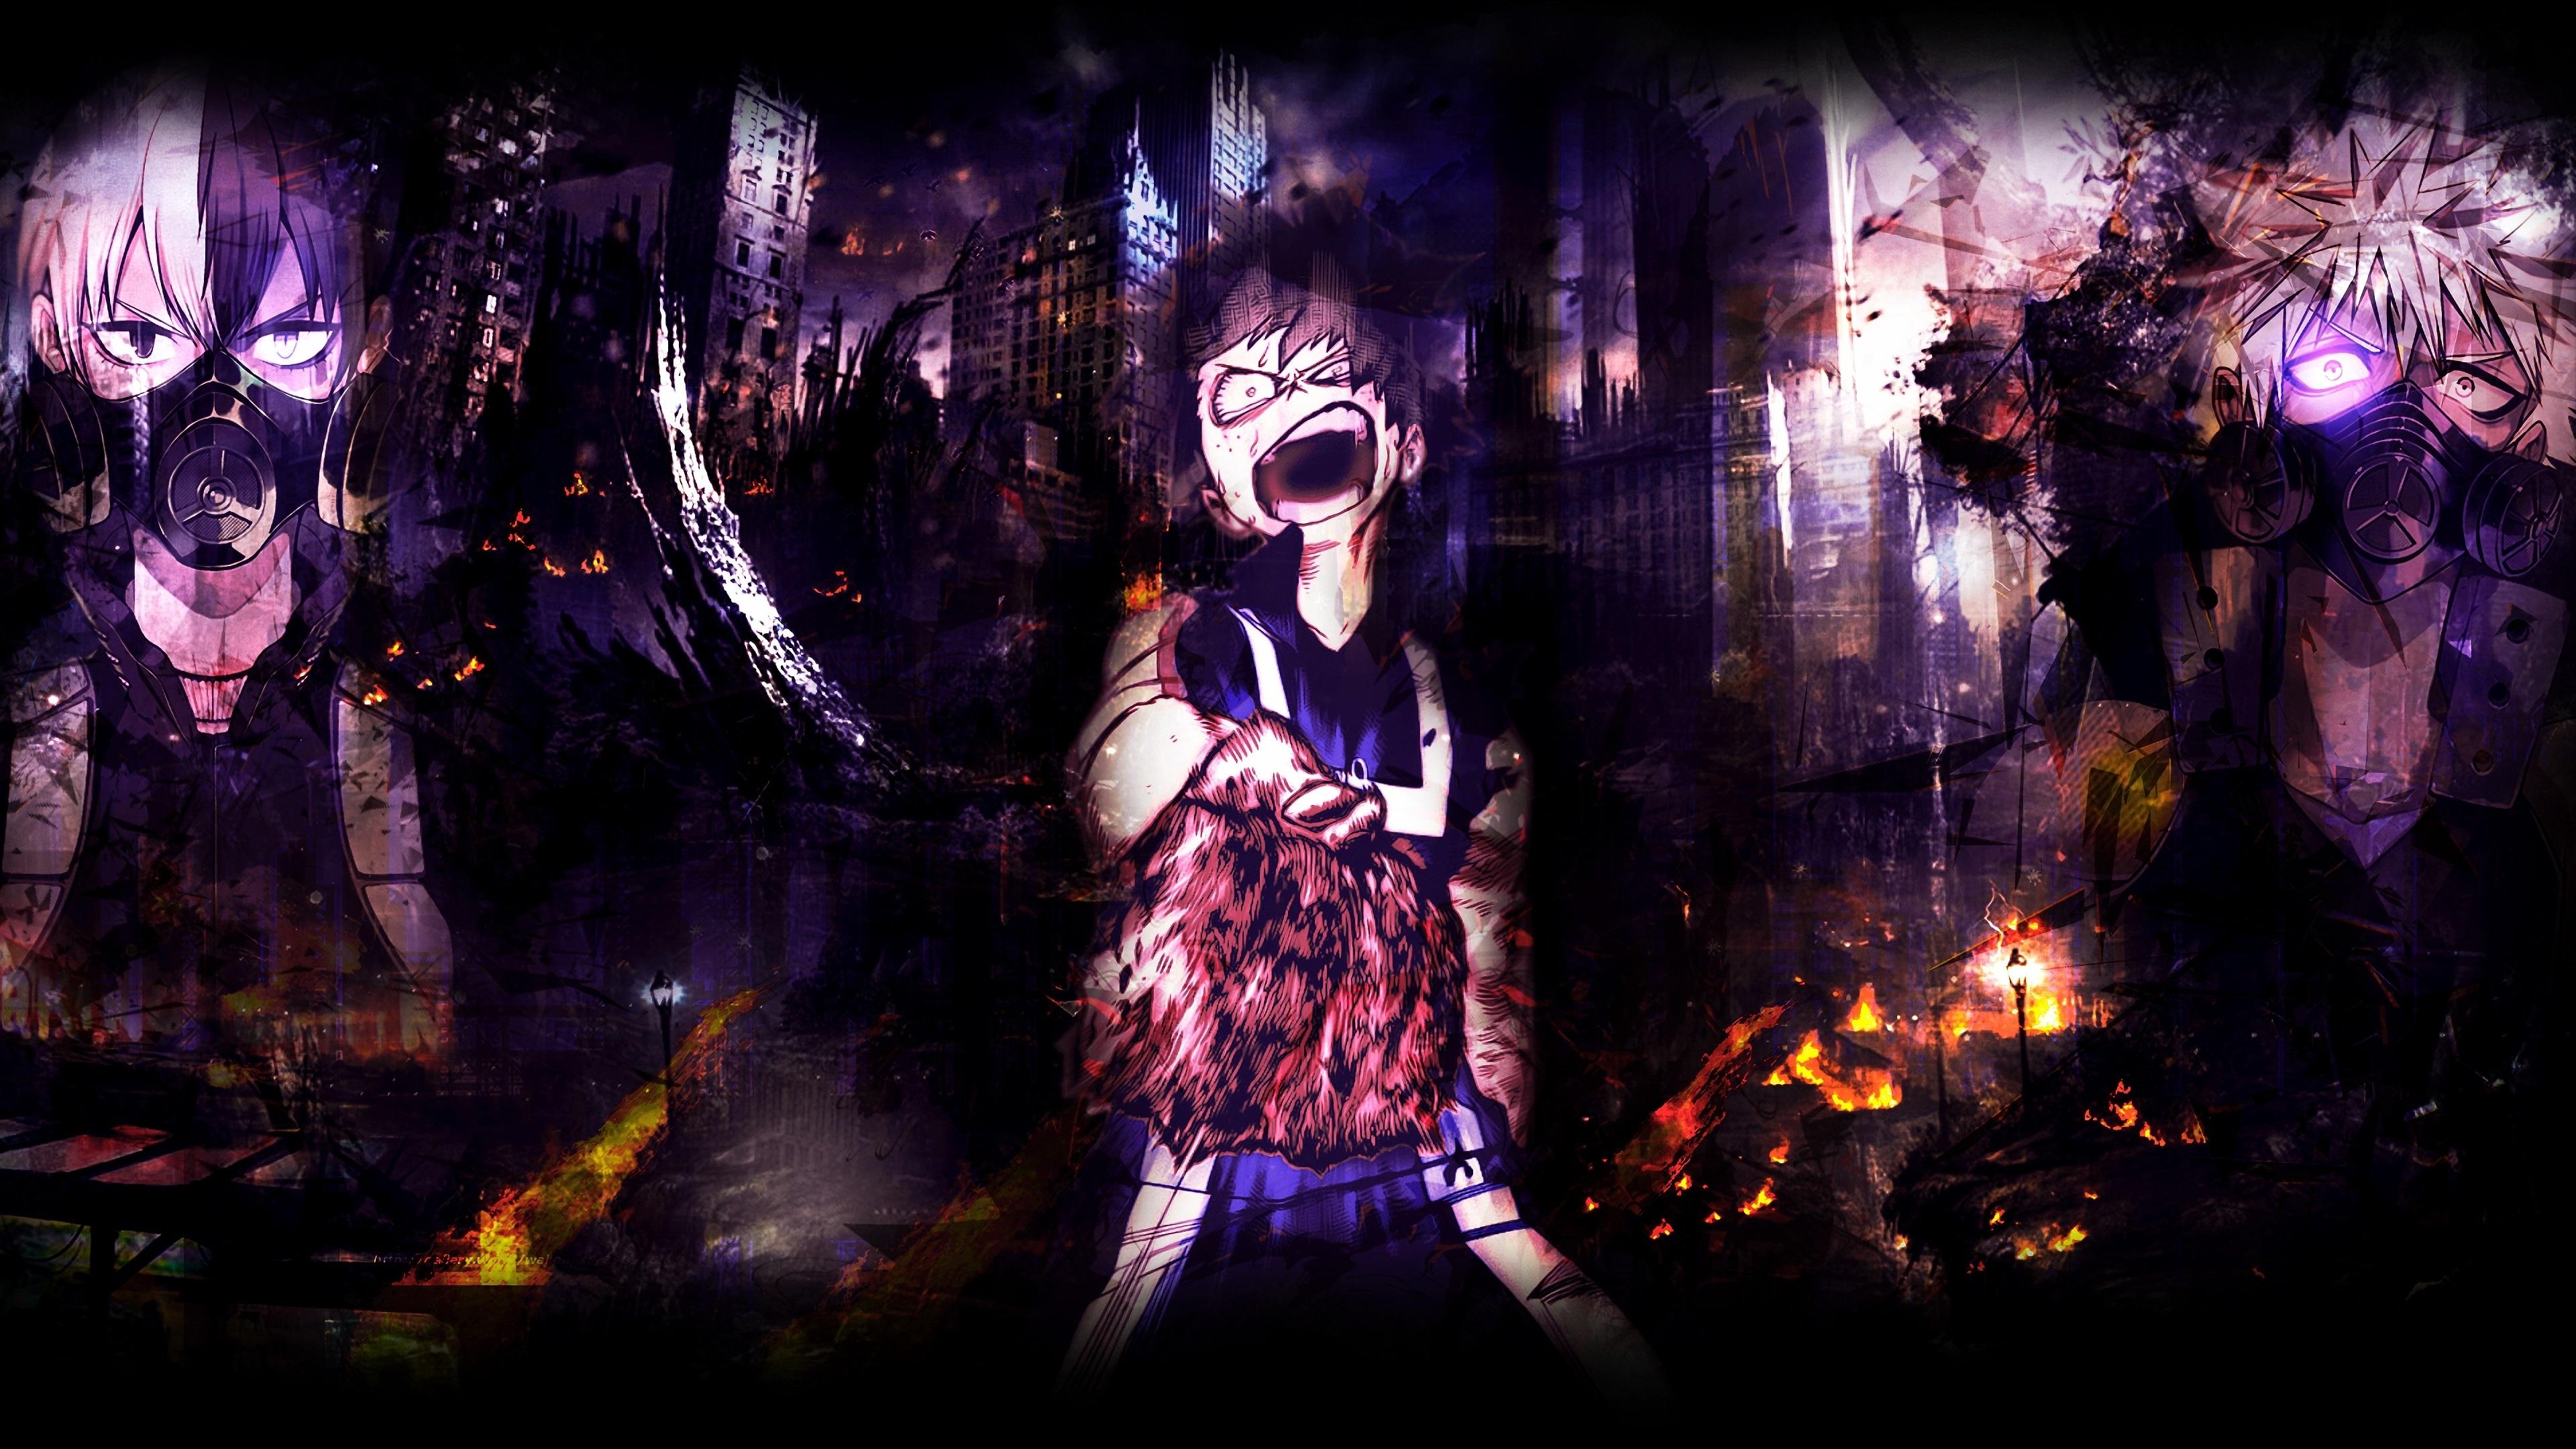 Izuku Midoriya Anime Art Wallpaper Hd Anime 4k Wallpapers